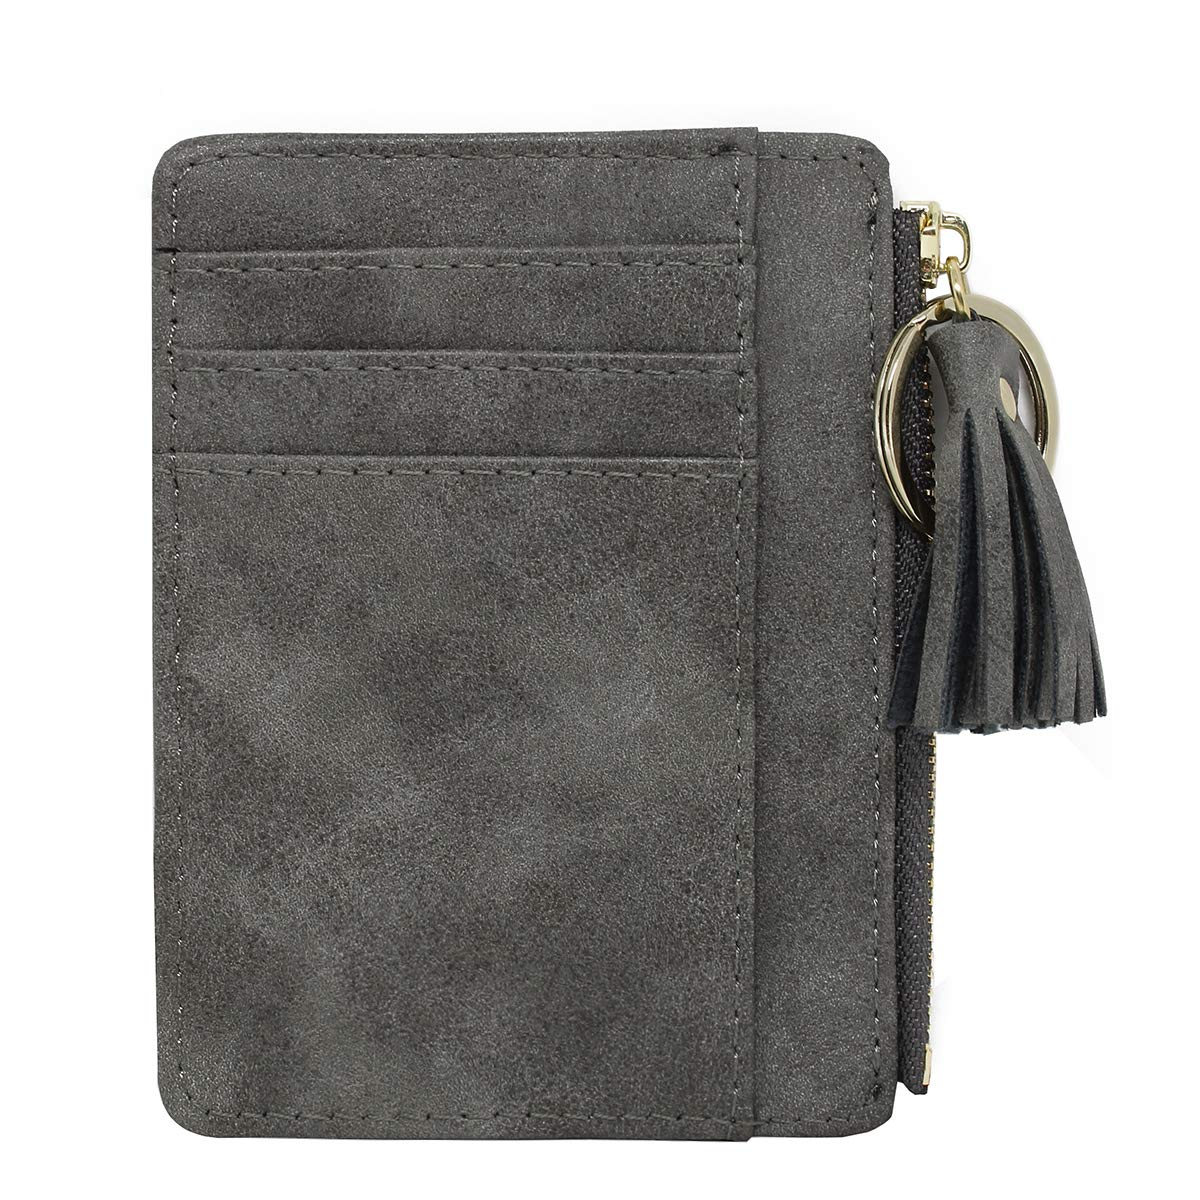 imeetu Slim Card Case Leather Card Holder, Front Pocket Wallets for Men/Women(Gray)